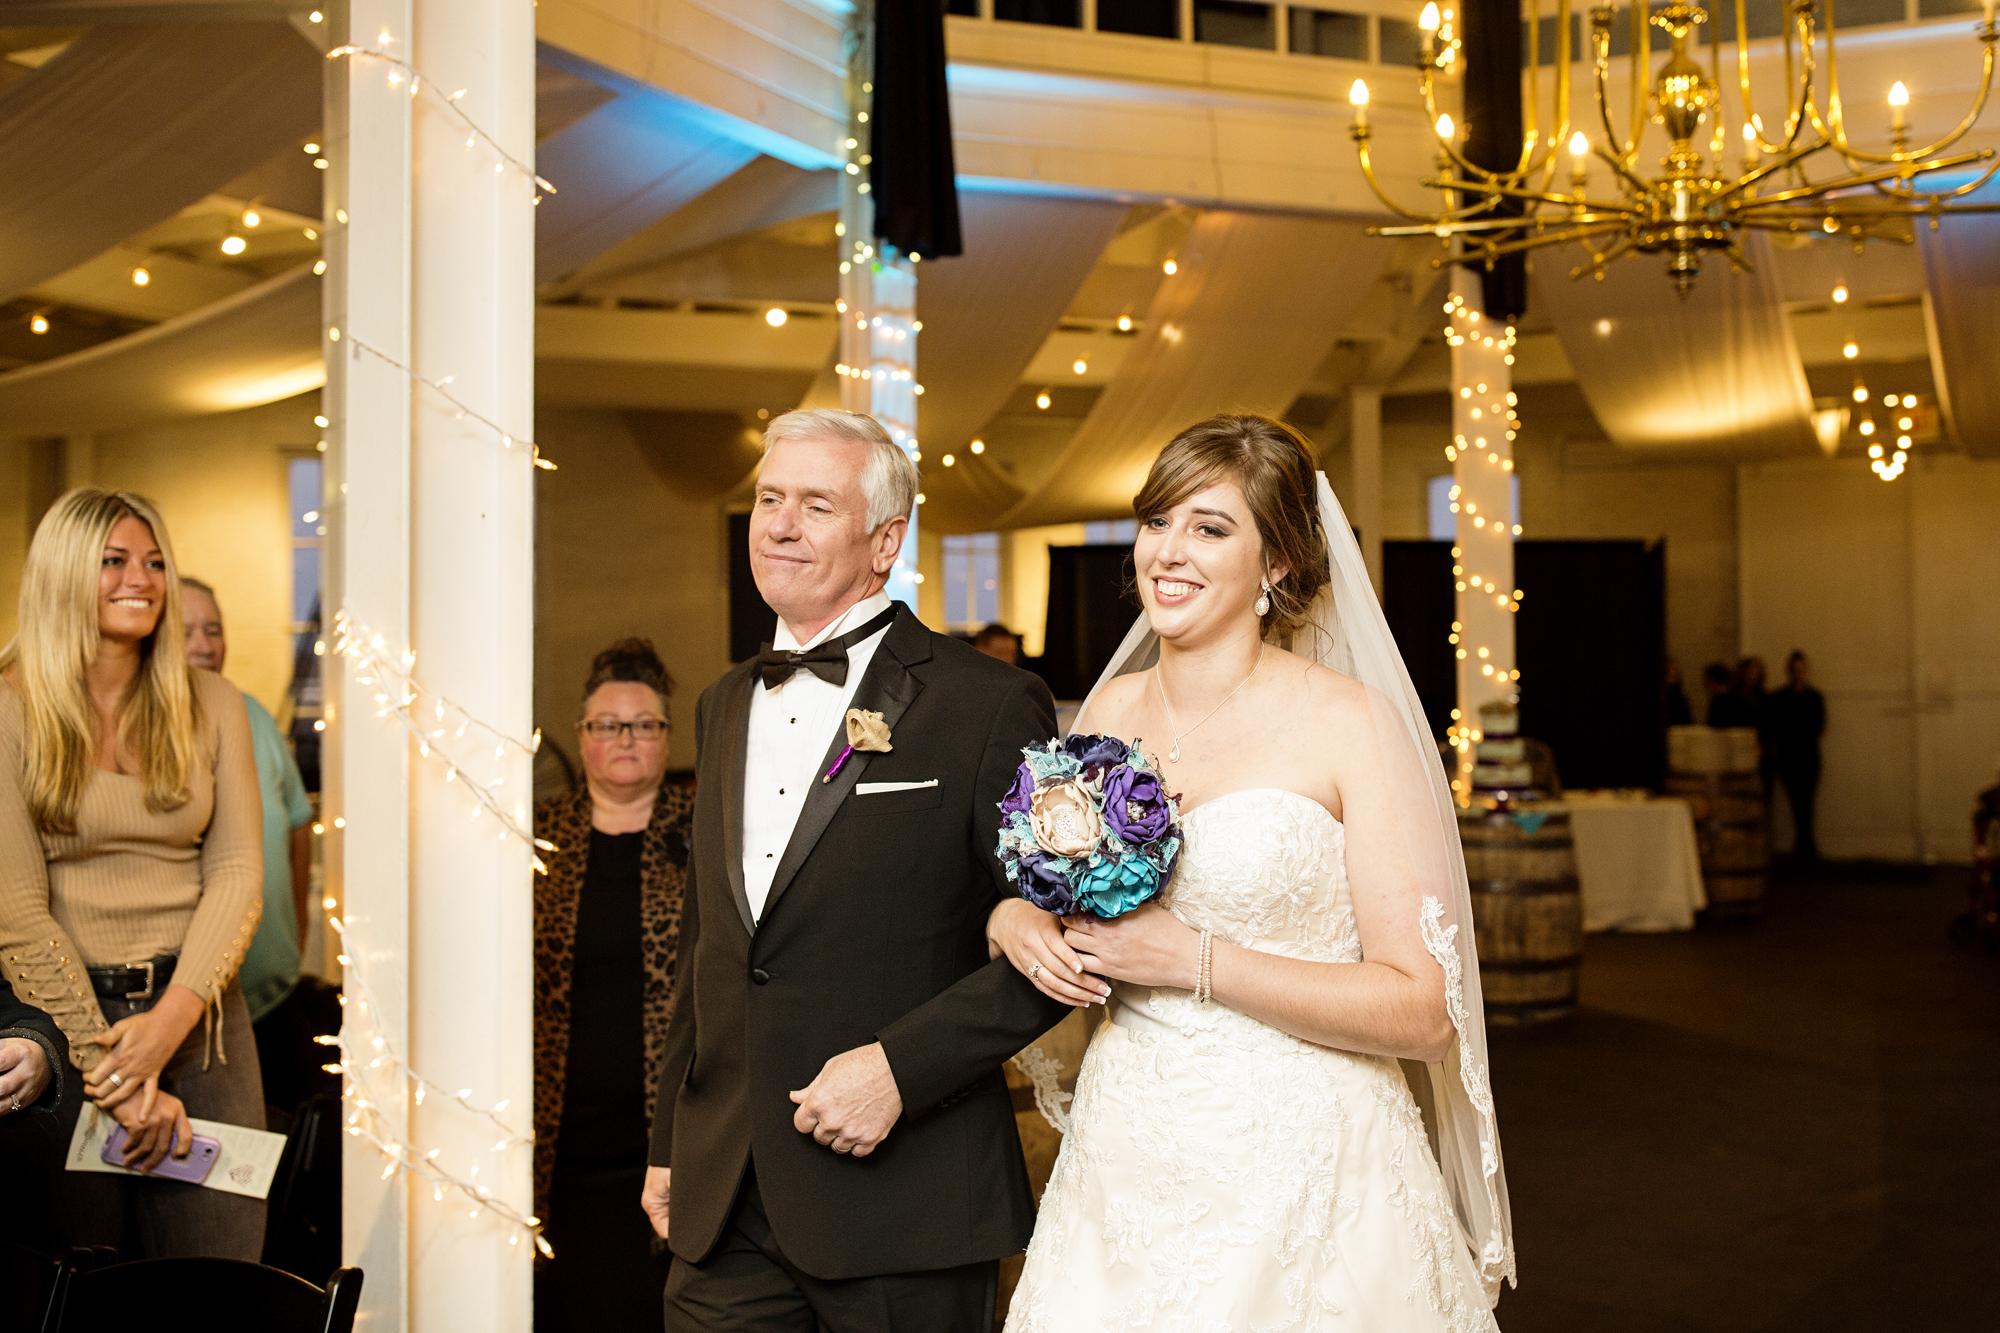 Seriously_Sabrina_Photography_Lexington_Kentucky_21c_Round_Barn_Red_Mile_Wedding_Gorley_59.jpg